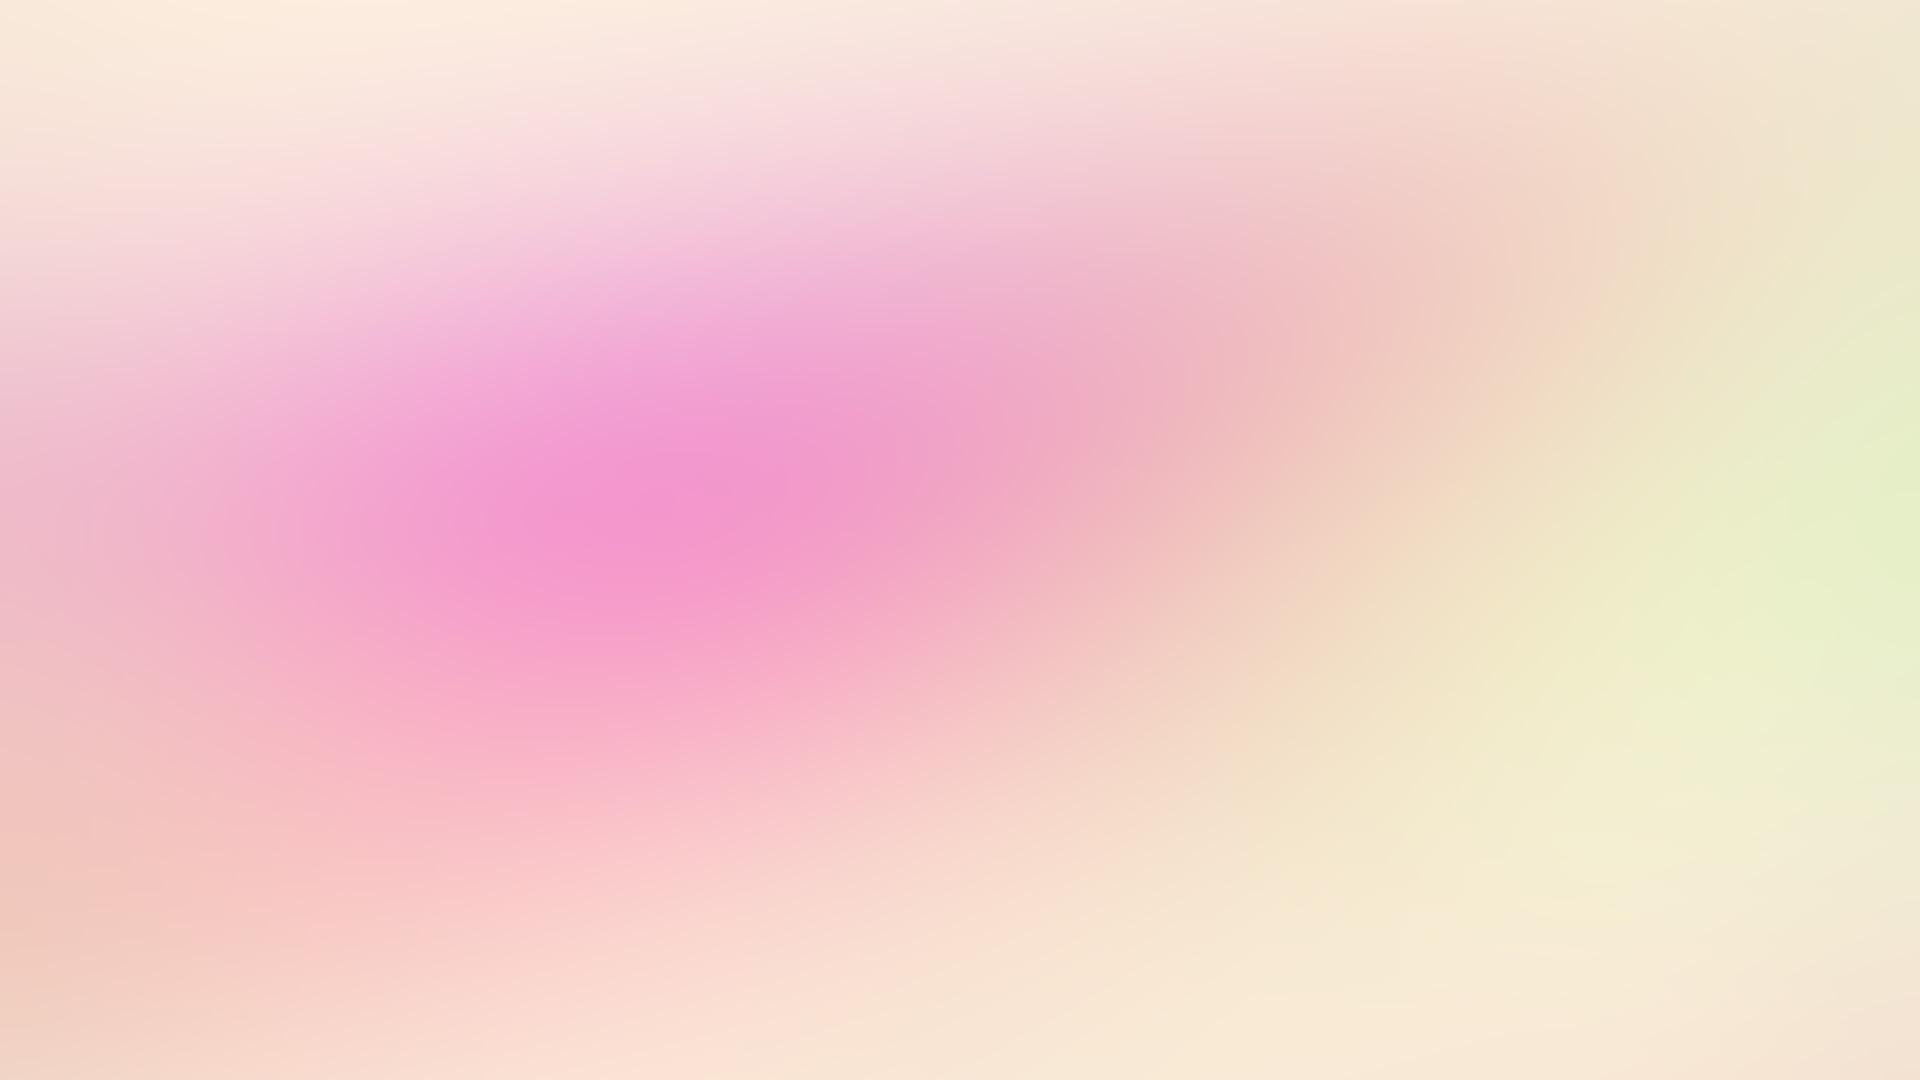 Pastel Pink Wallpaper Cute Si51 Soft Pastel Red Gradation Blur Wallpaper